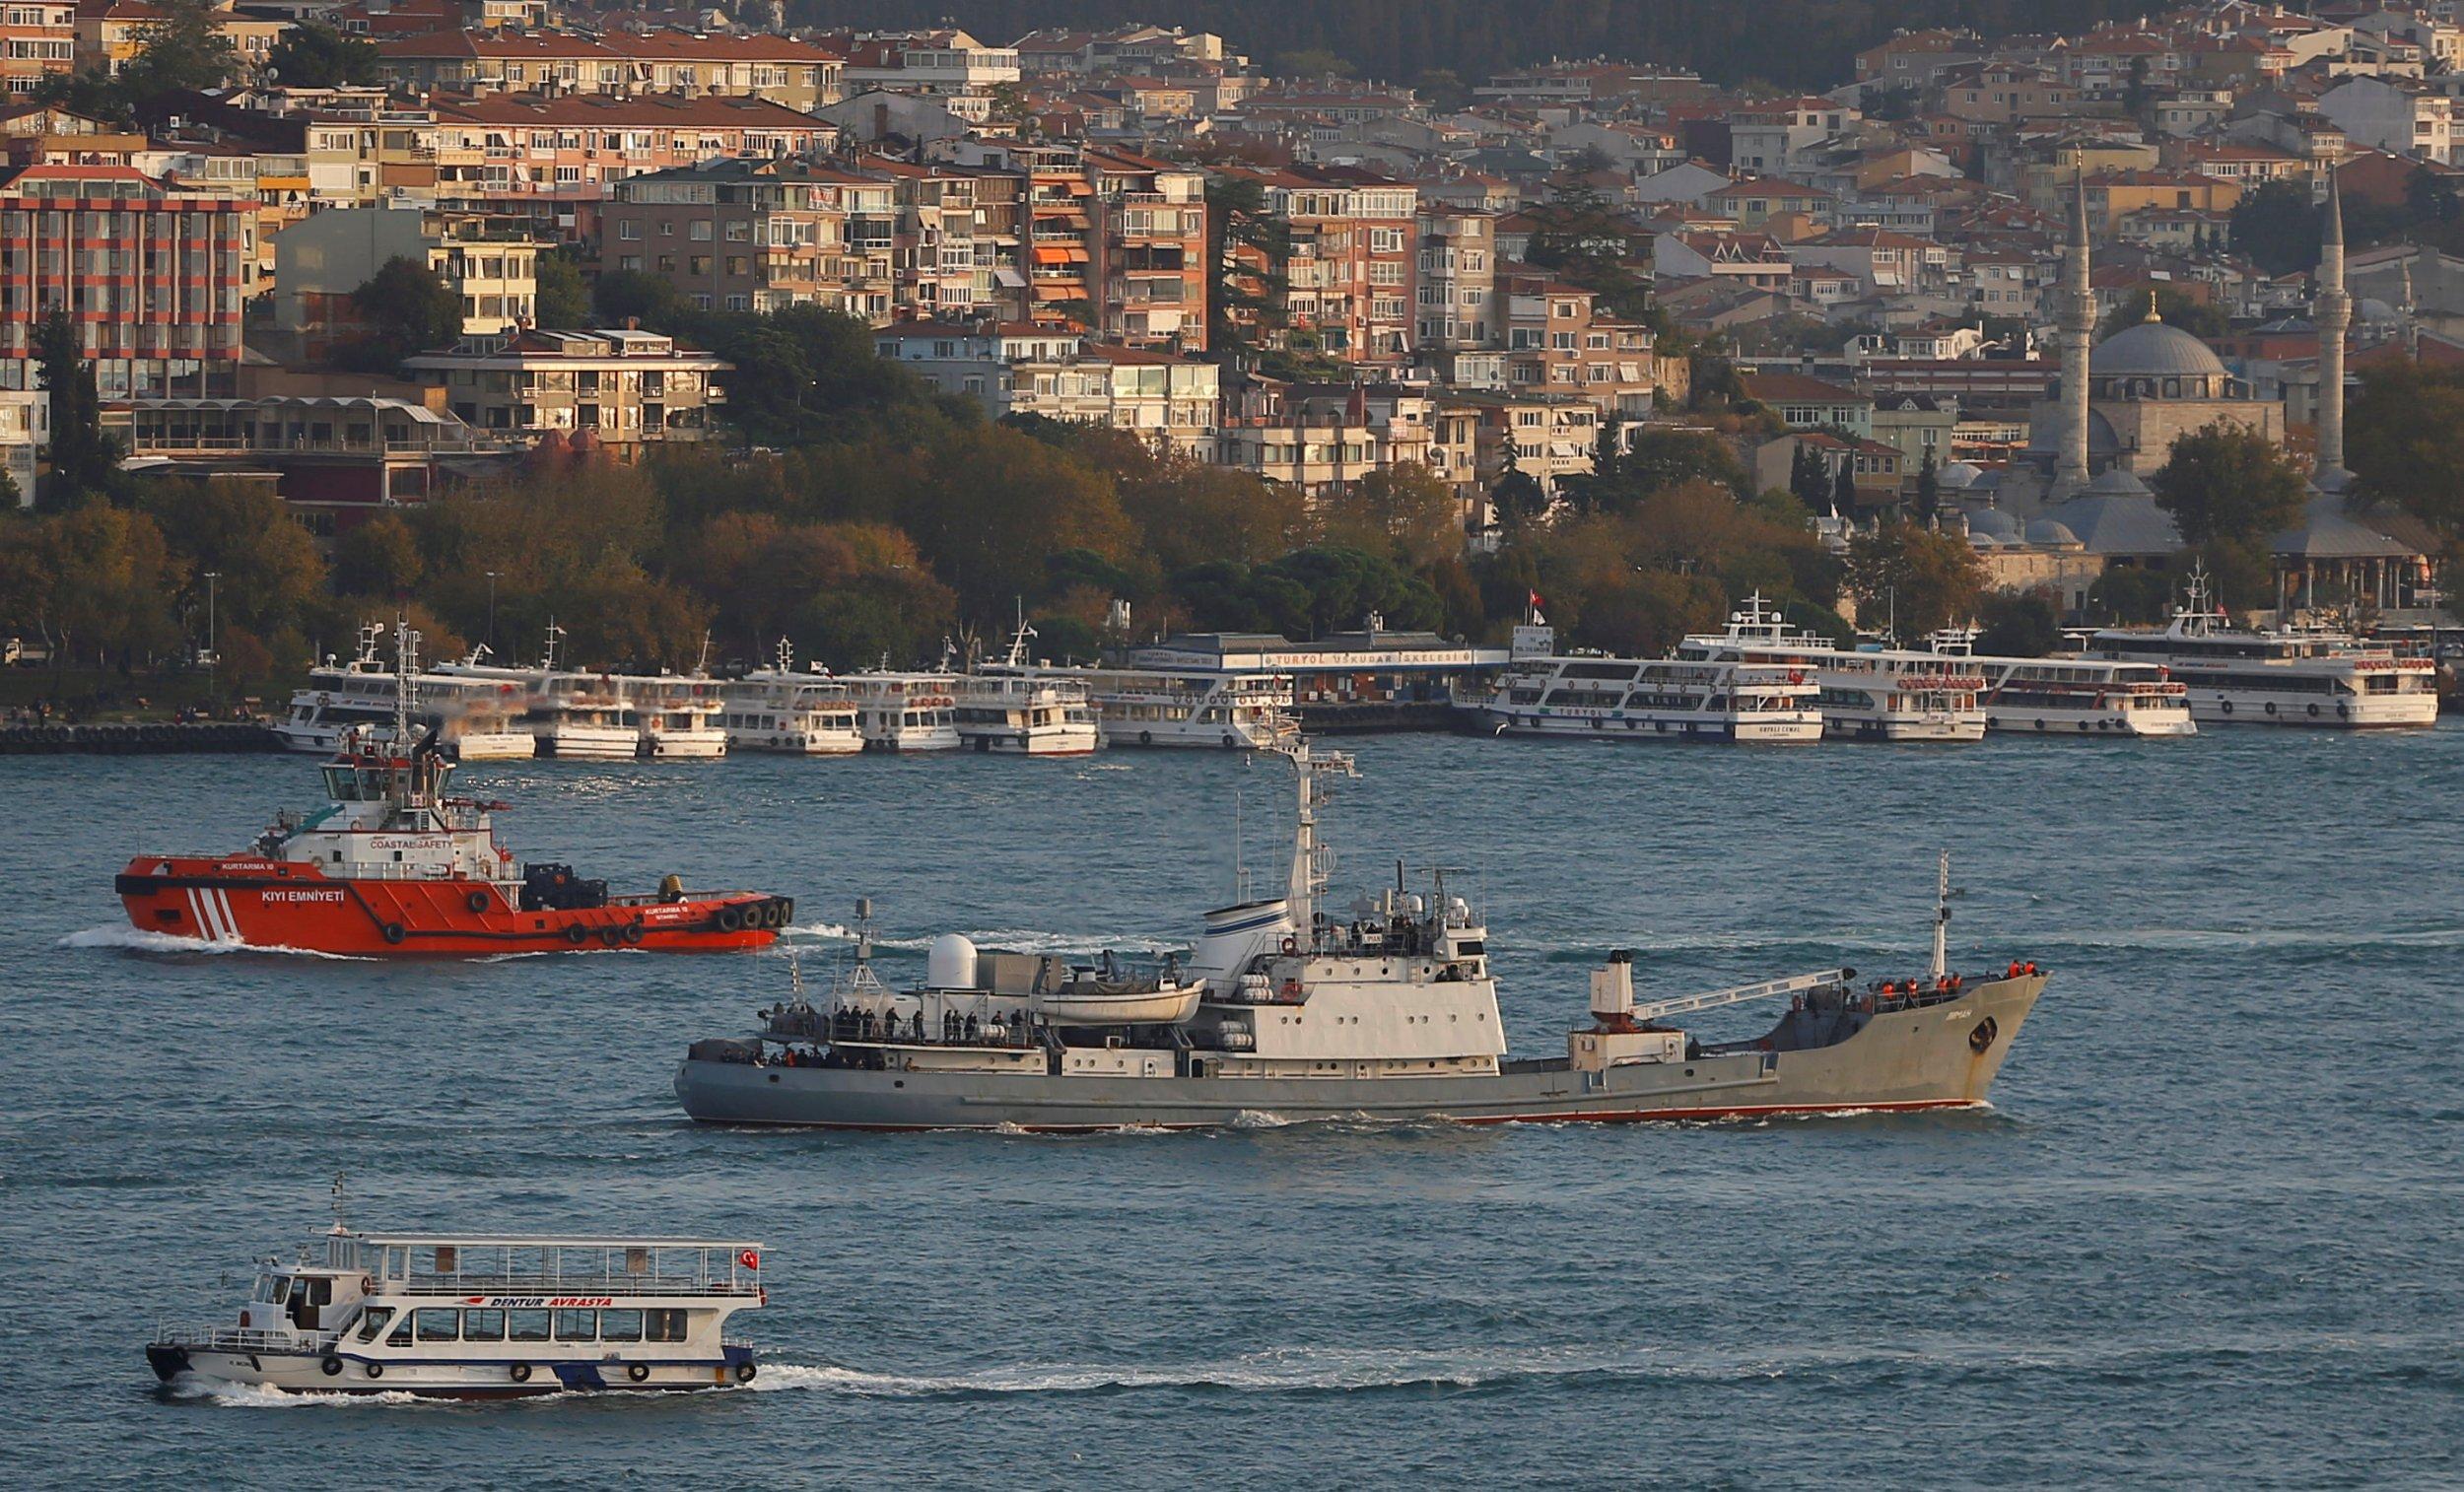 Russian navy ship in Turkey